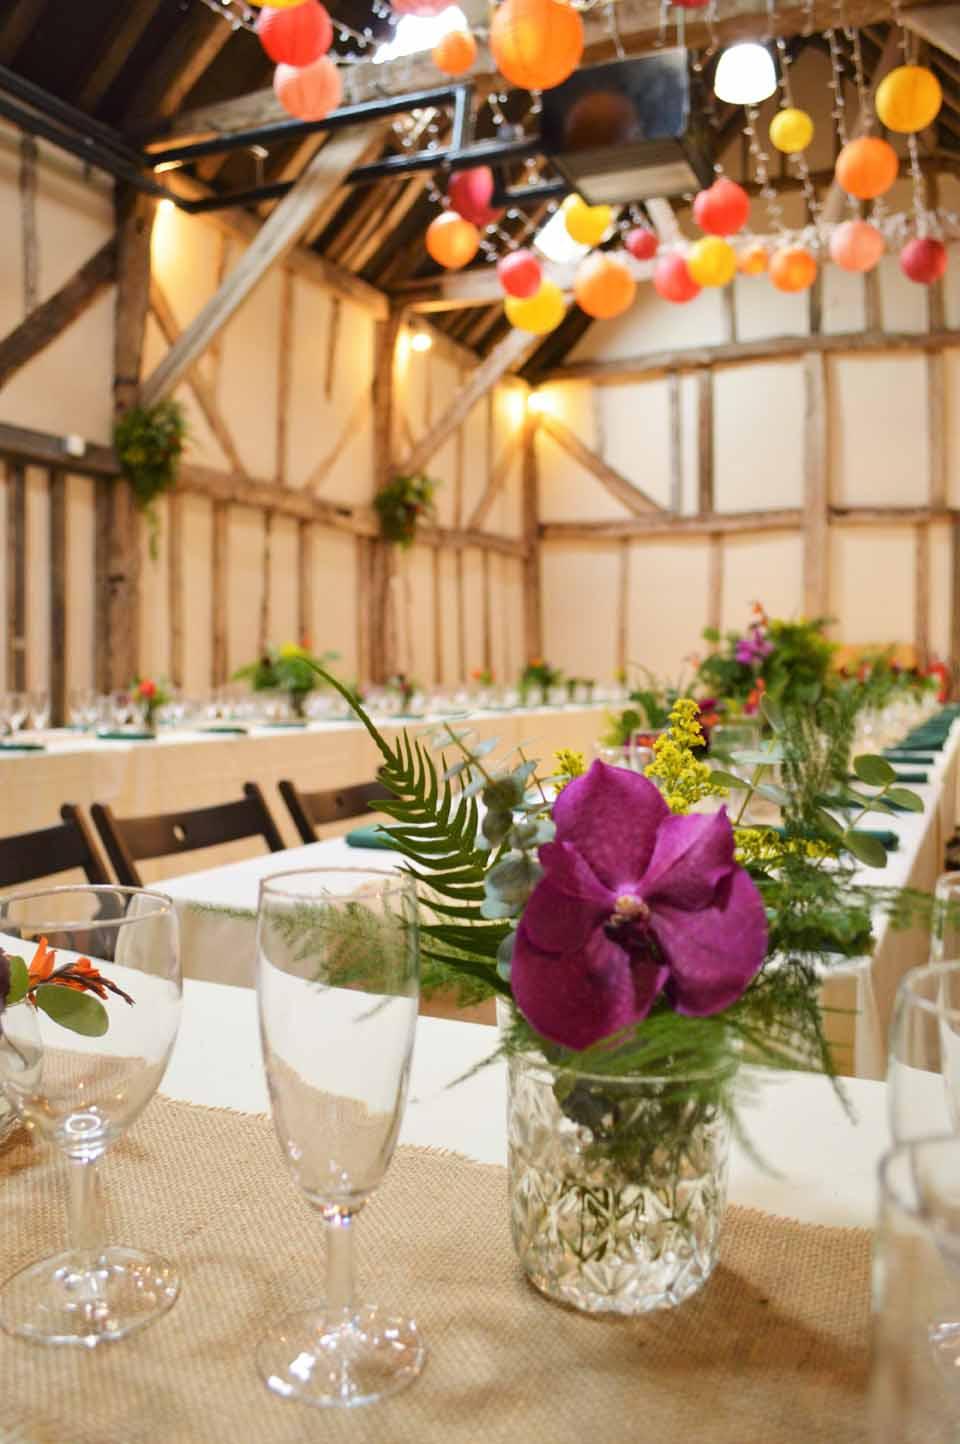 patricks barn chiddinglye wedding lanterns and flowers not your average i do